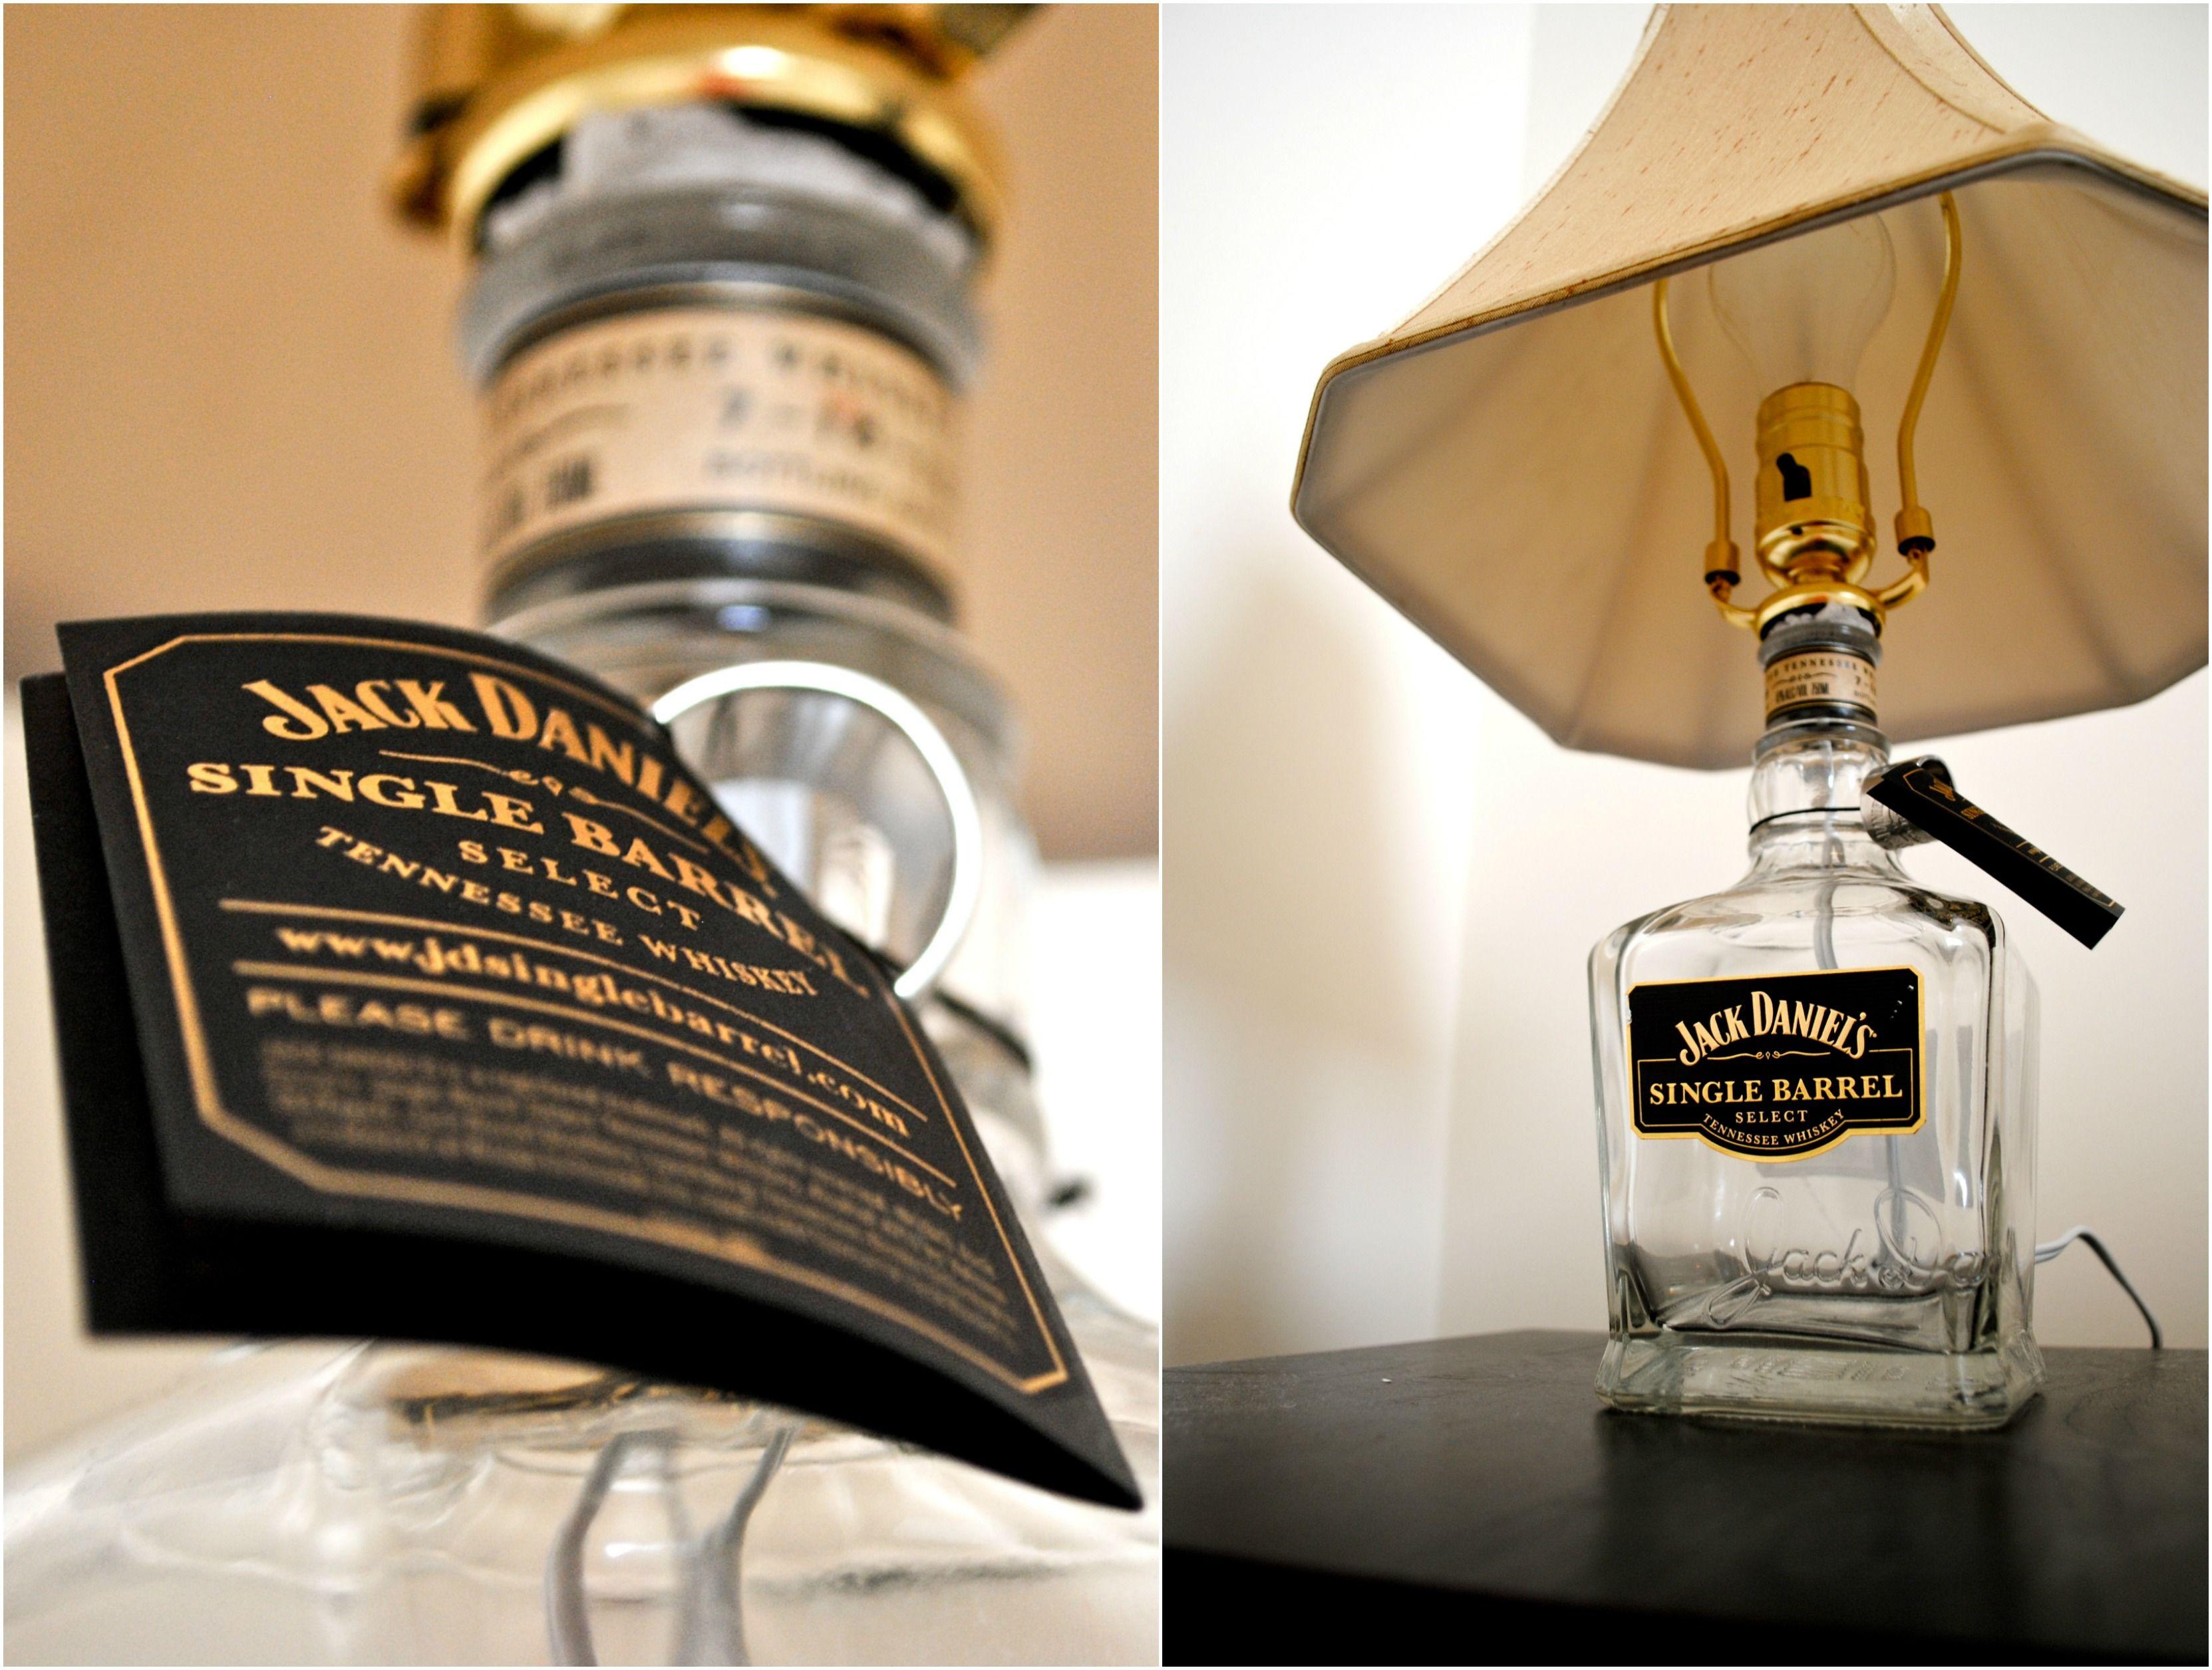 Jack Daniels Single Barrel Lamp